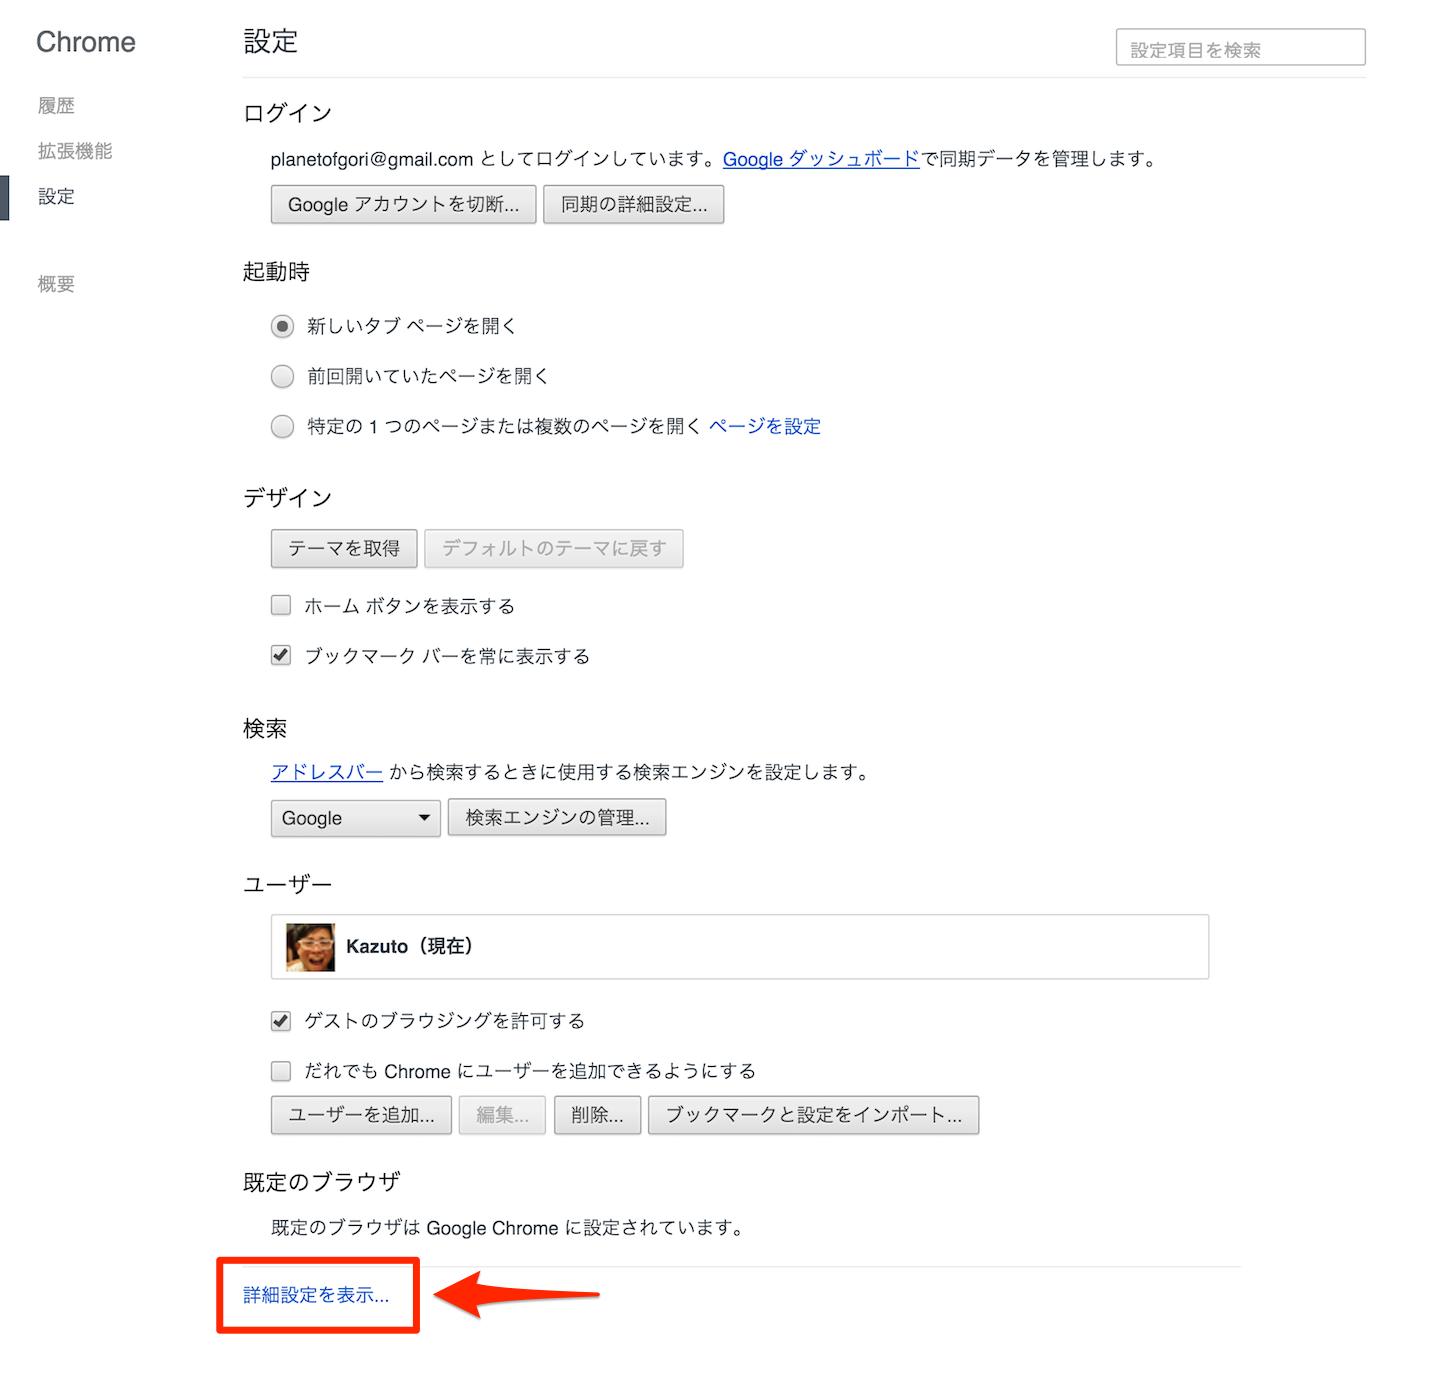 Google Chromeの通知をオフにする方法